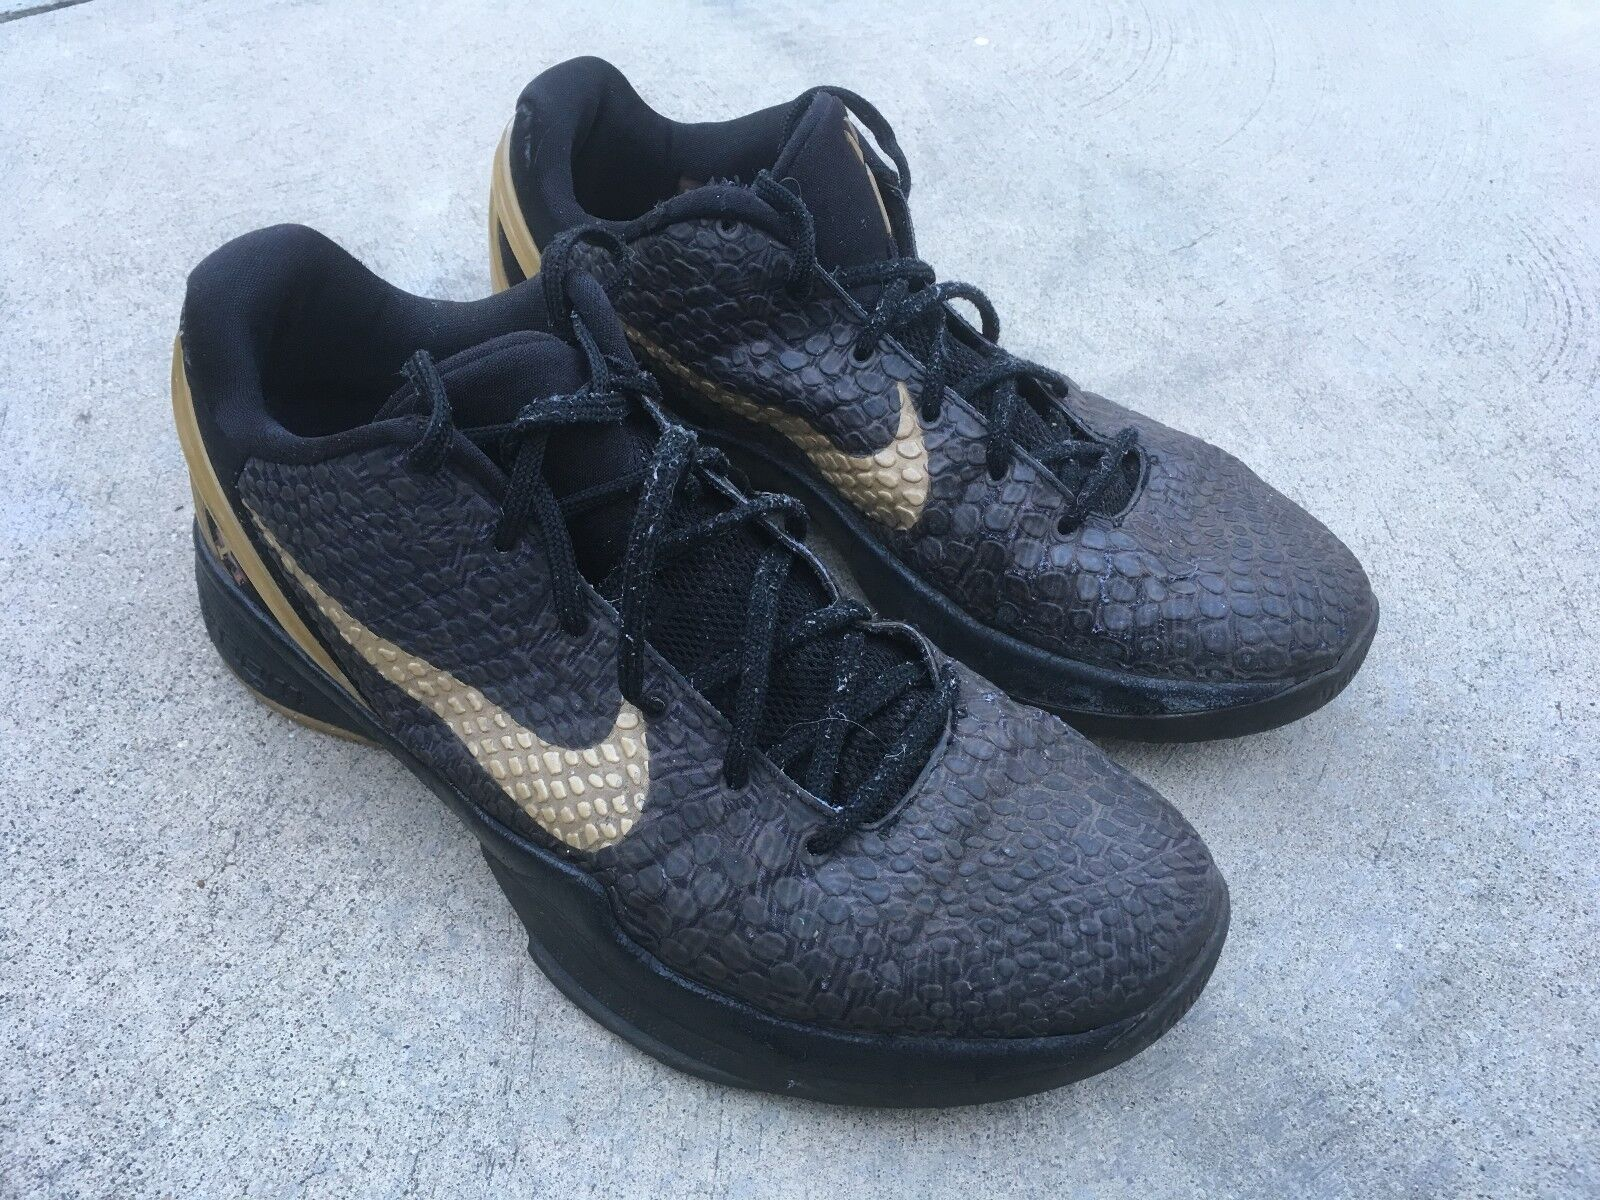 Nike zoom kobe 6 vi bhm month sz 10 schwarz history month bhm mamba gold 3de584